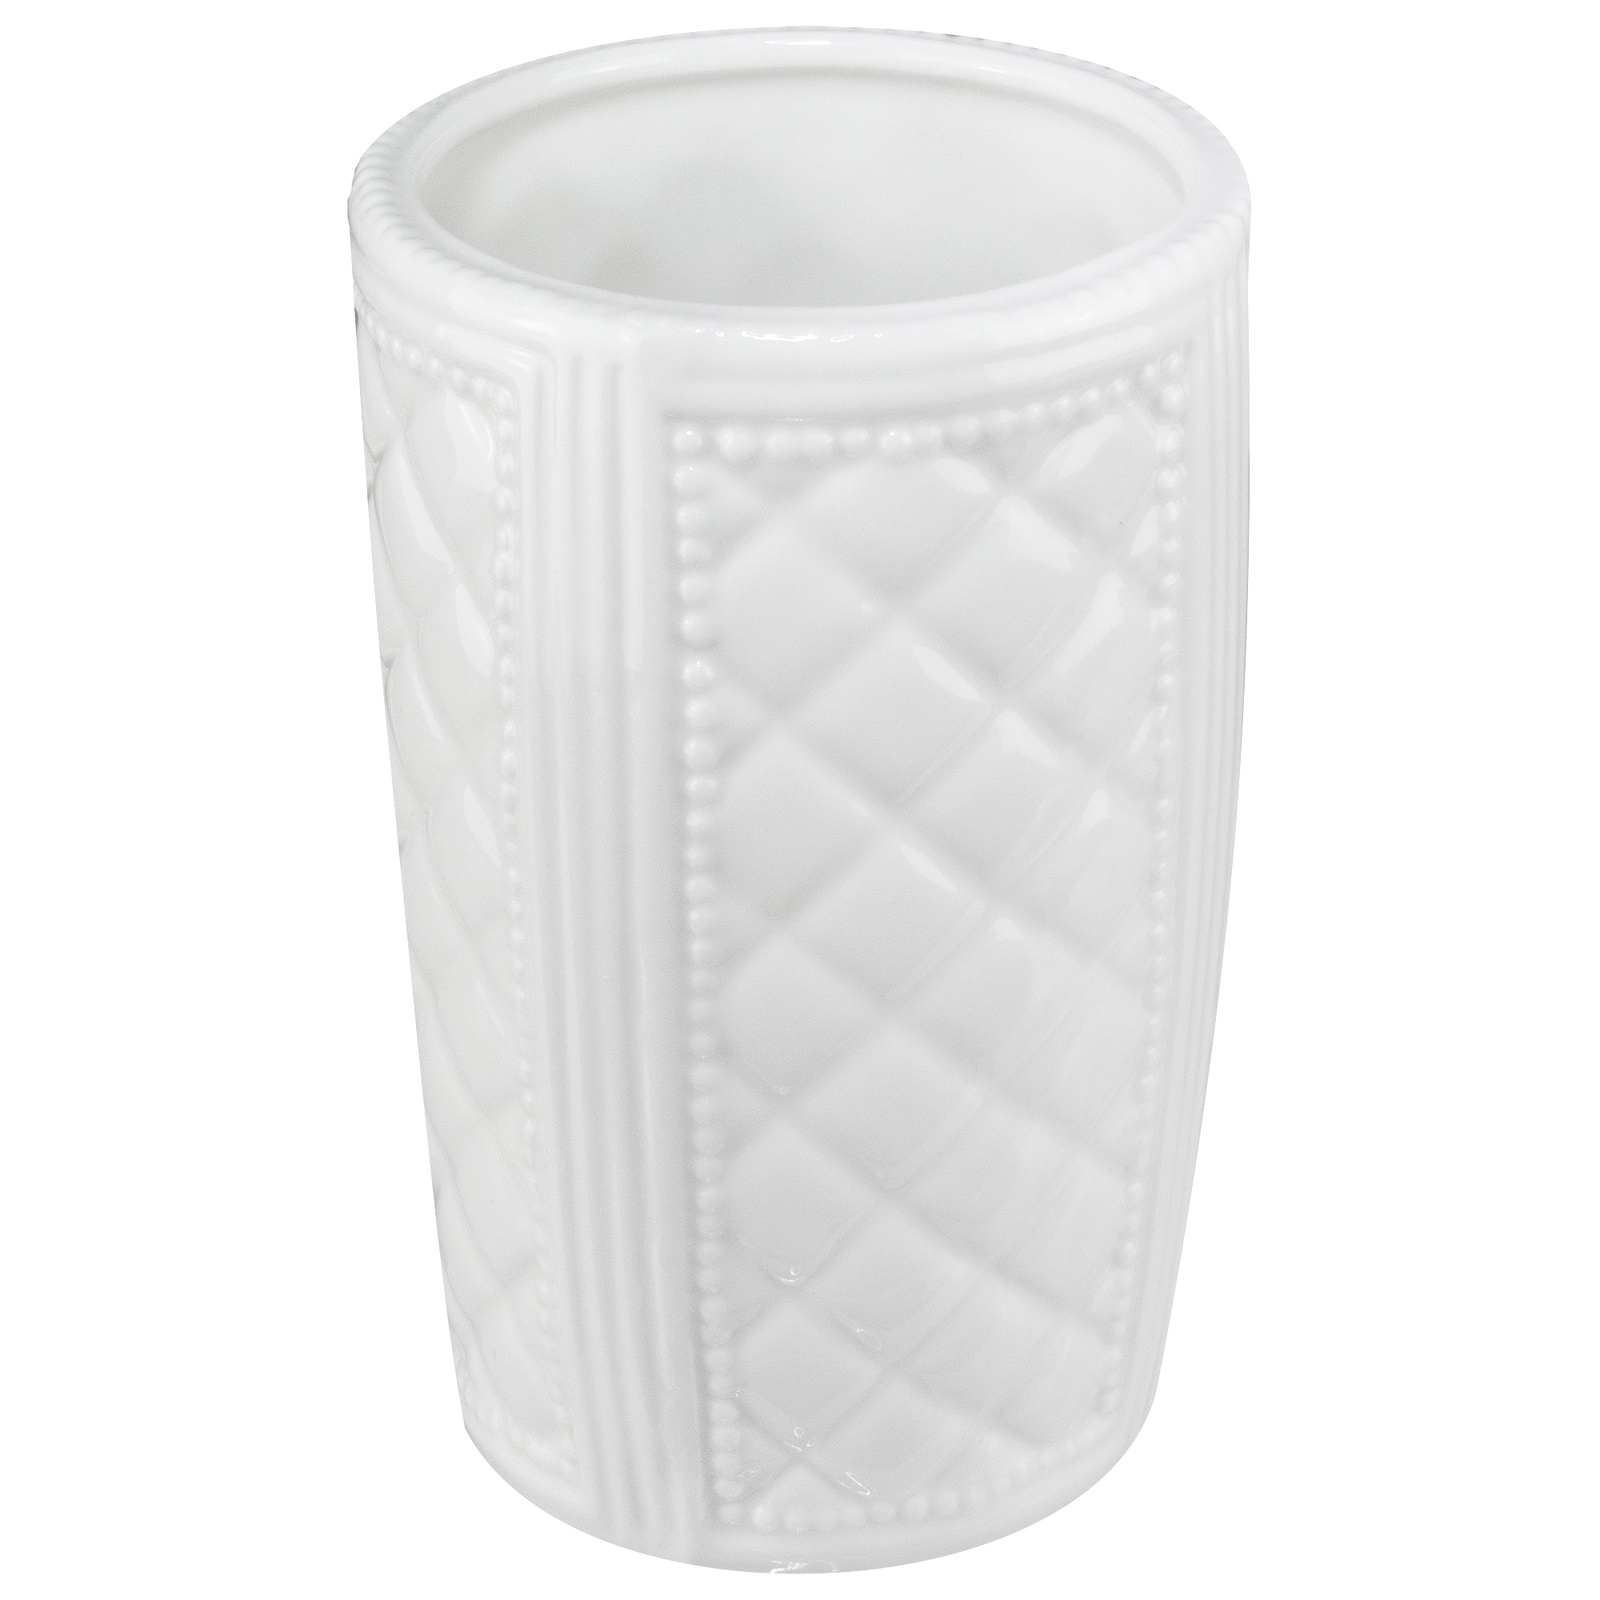 Стакан для ванной комнаты Vanstore 388-01, белый стакан для ванной комнаты vanstore wiki бирюзовый